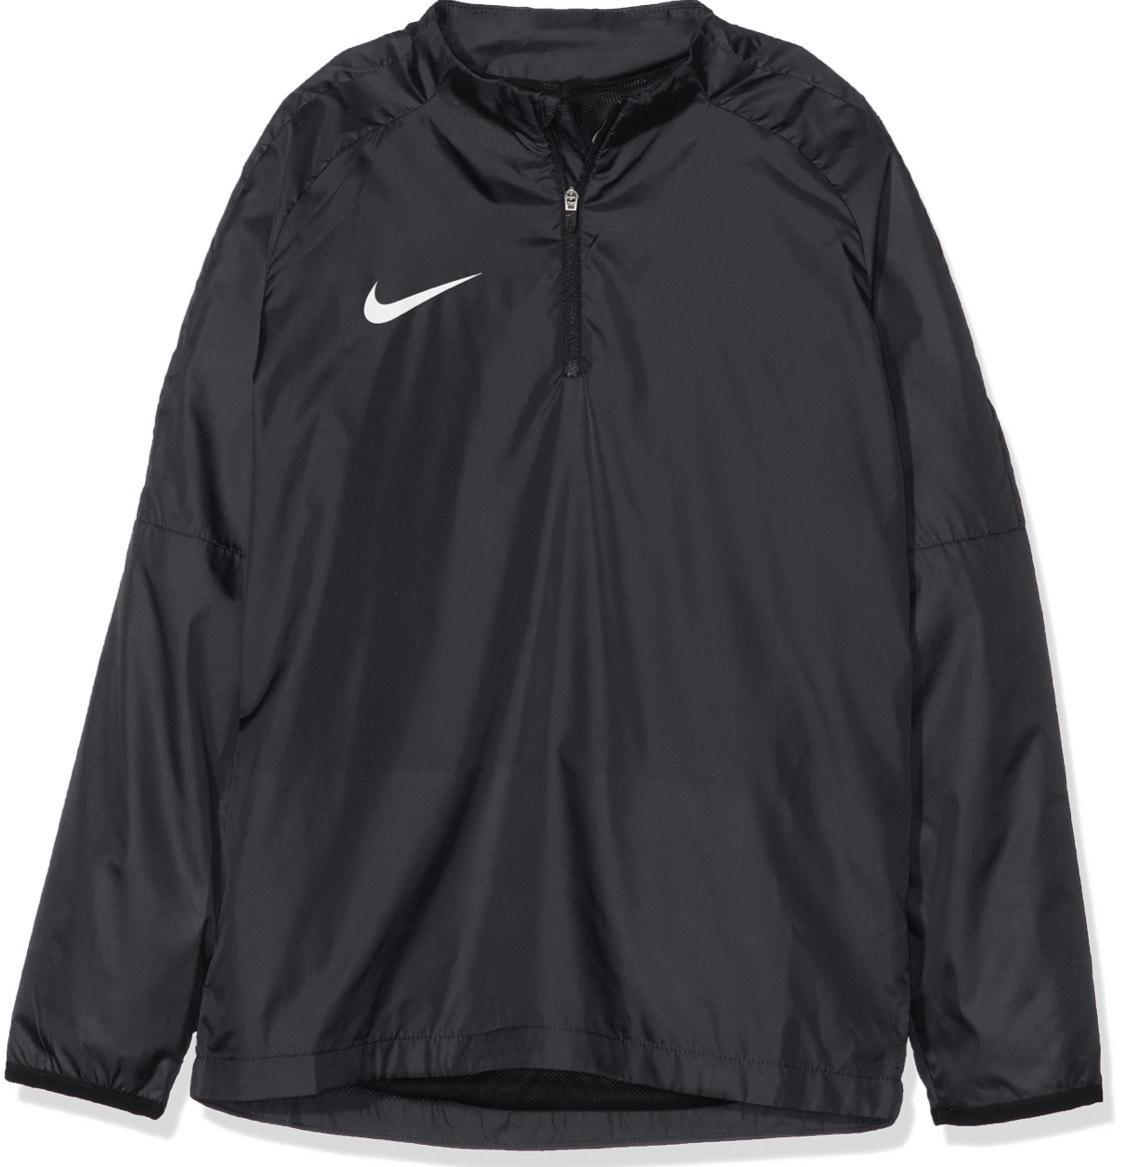 Amazon: Nike Academy18 Drill Top Shield Talla Ch